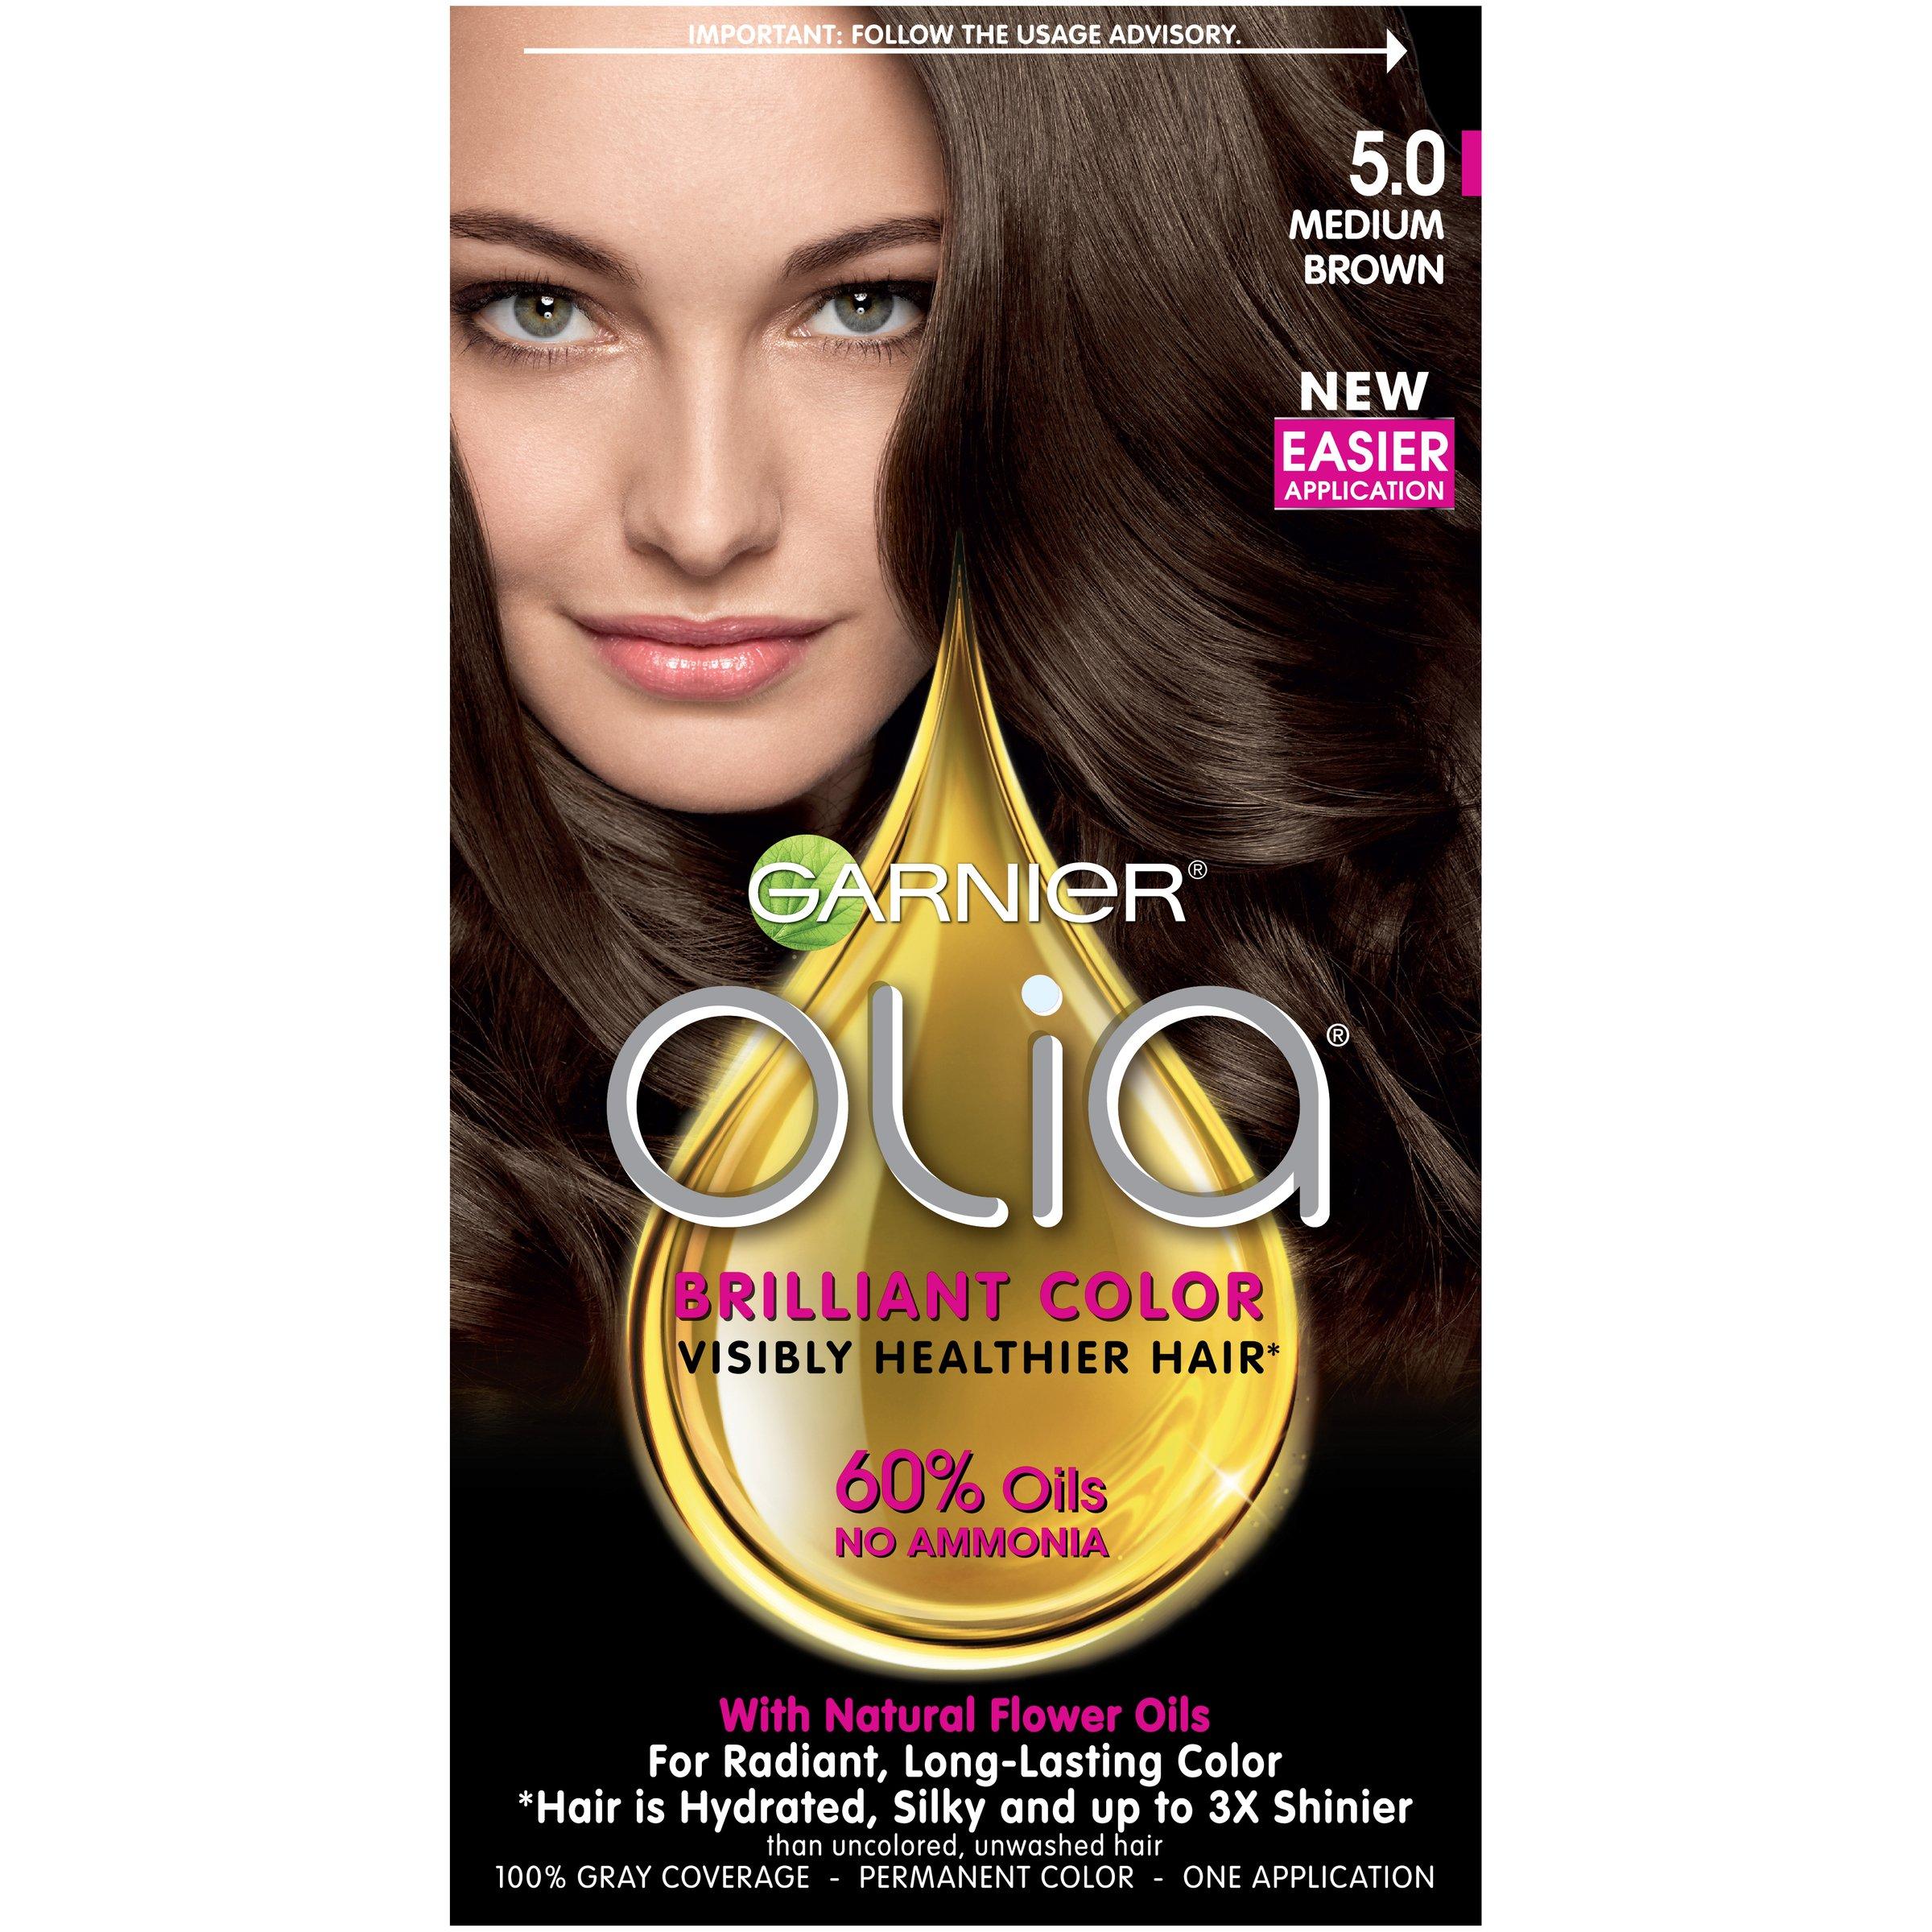 Amazon.com: Garnier Olia Hair Color, 4.0 Dark Brown, Ammonia Free ...